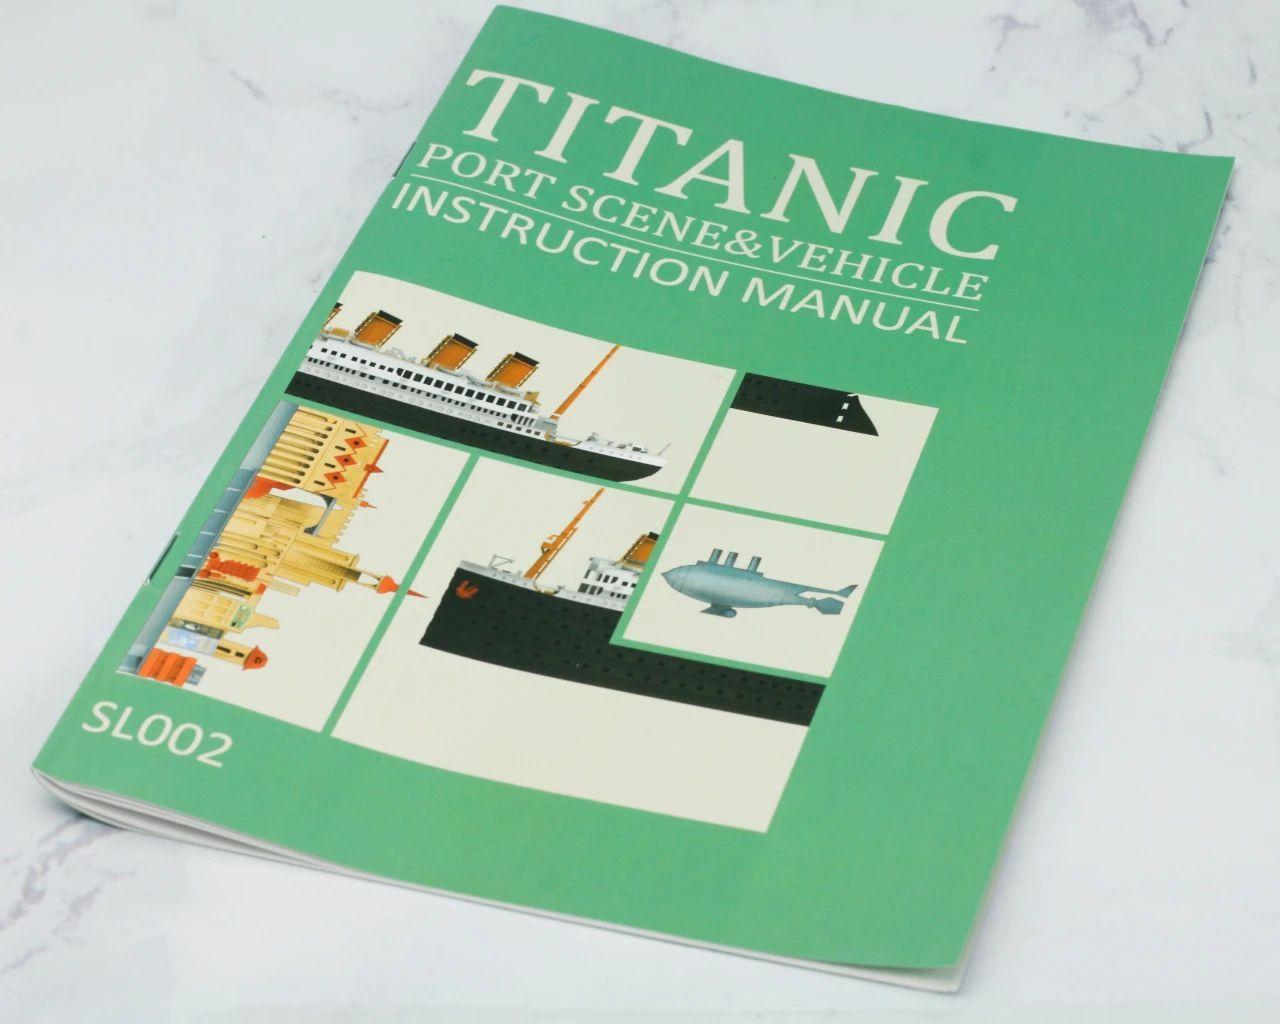 S484_1_2_RMS_Titanic_ice_SOUTHAMPTON_011.jpg